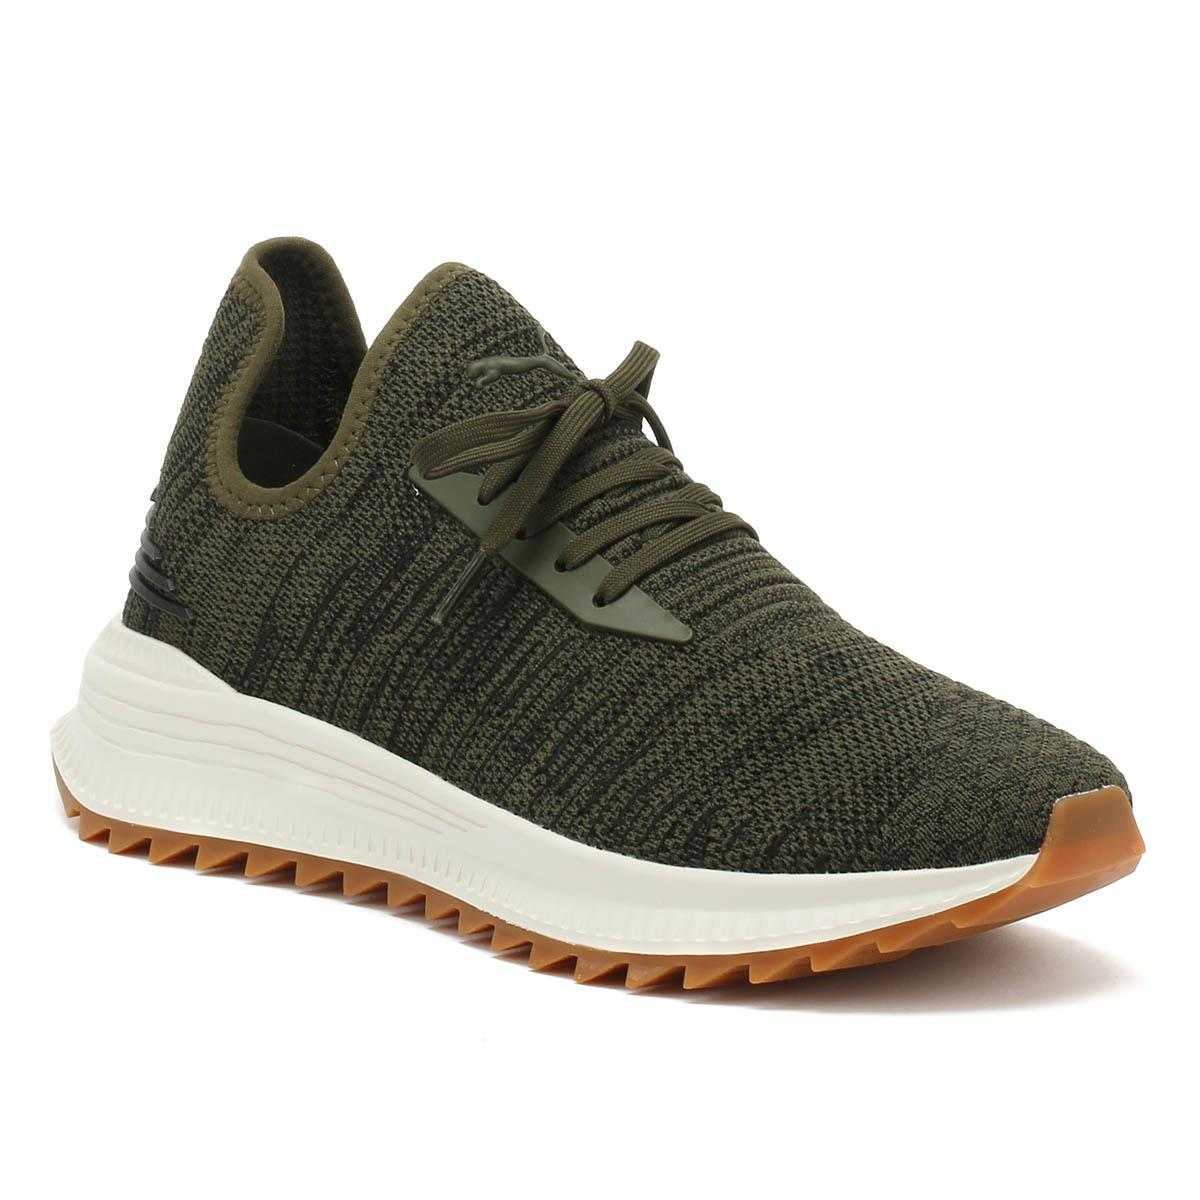 Avid Waterrplnt Mens Forest Night Green Sneakers